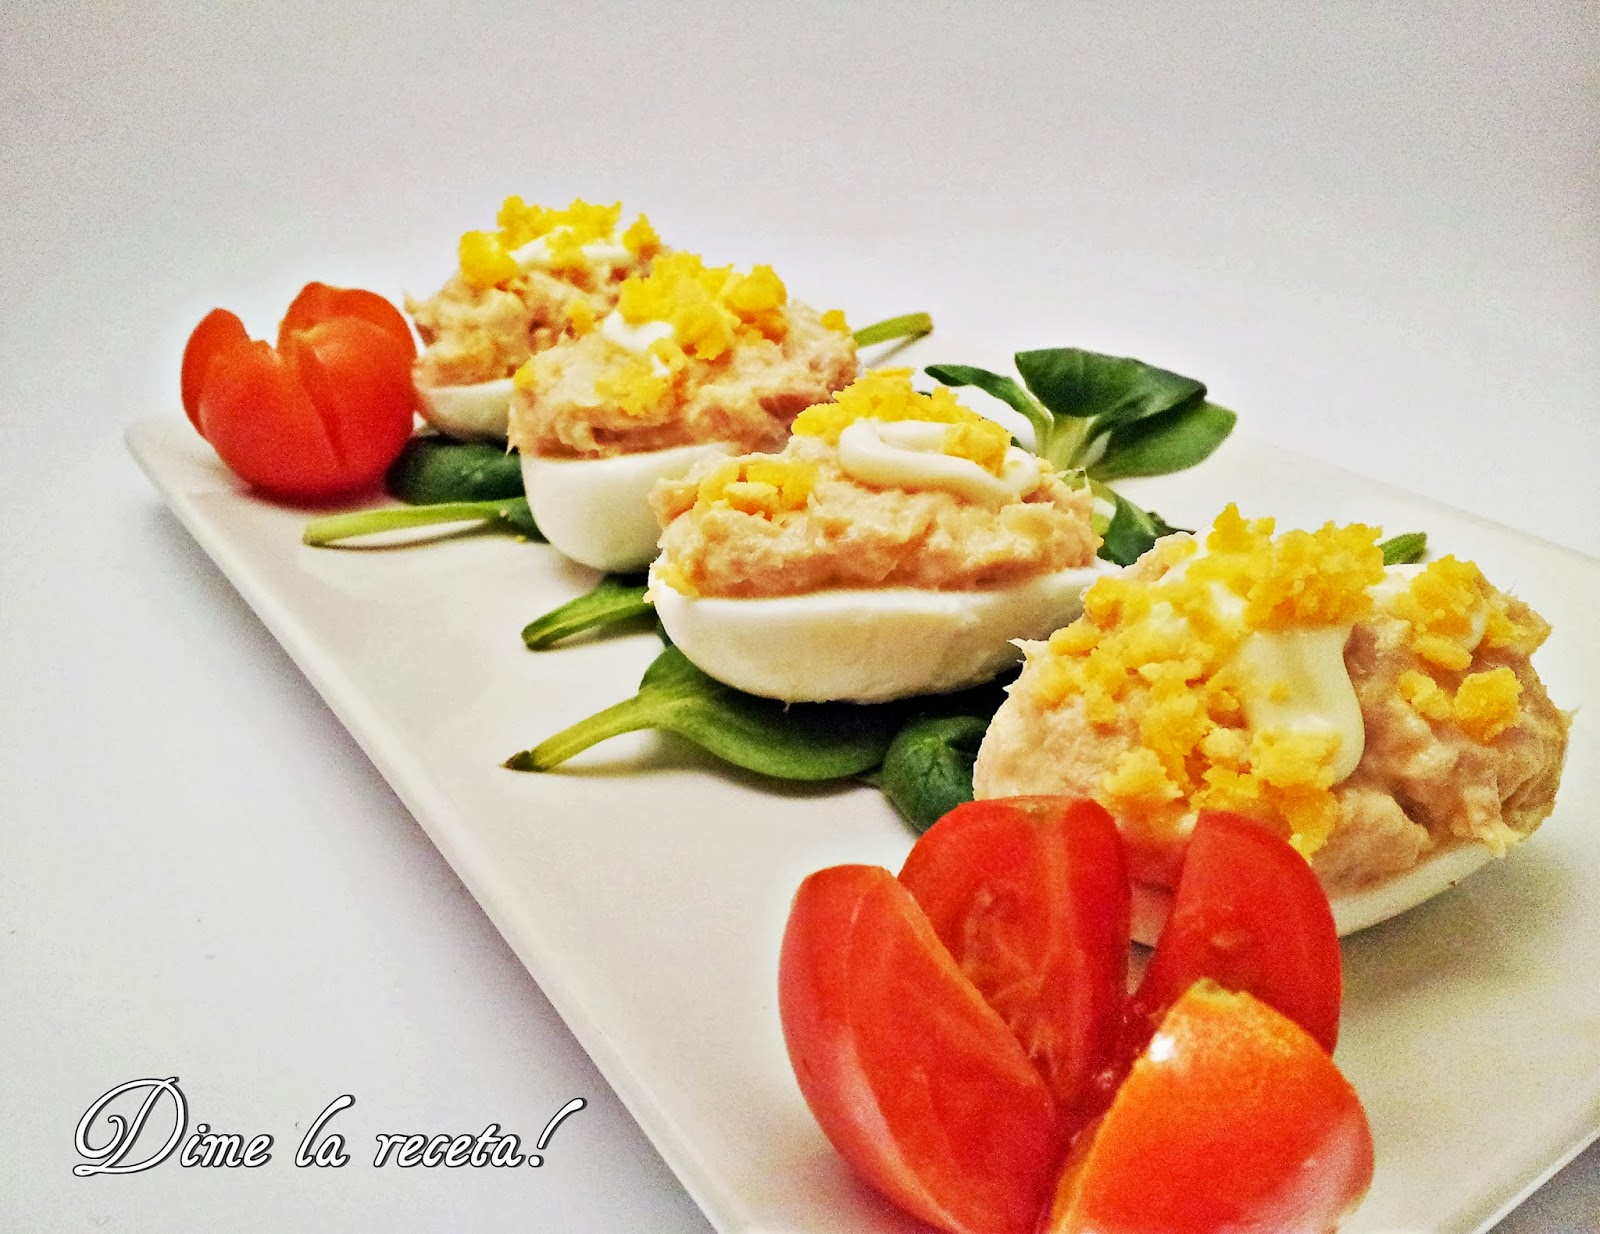 Dime la receta huevos rellenos - Como decorar platos ...